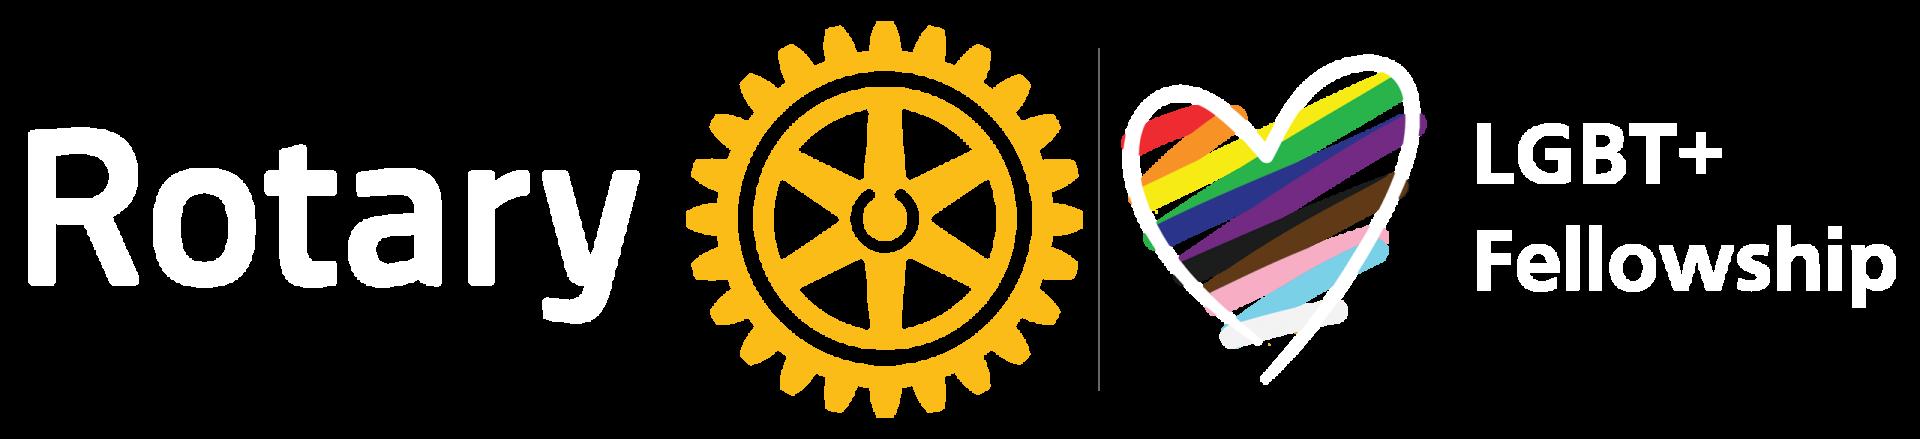 Rotary logo and LGBT+ Fellowship logo